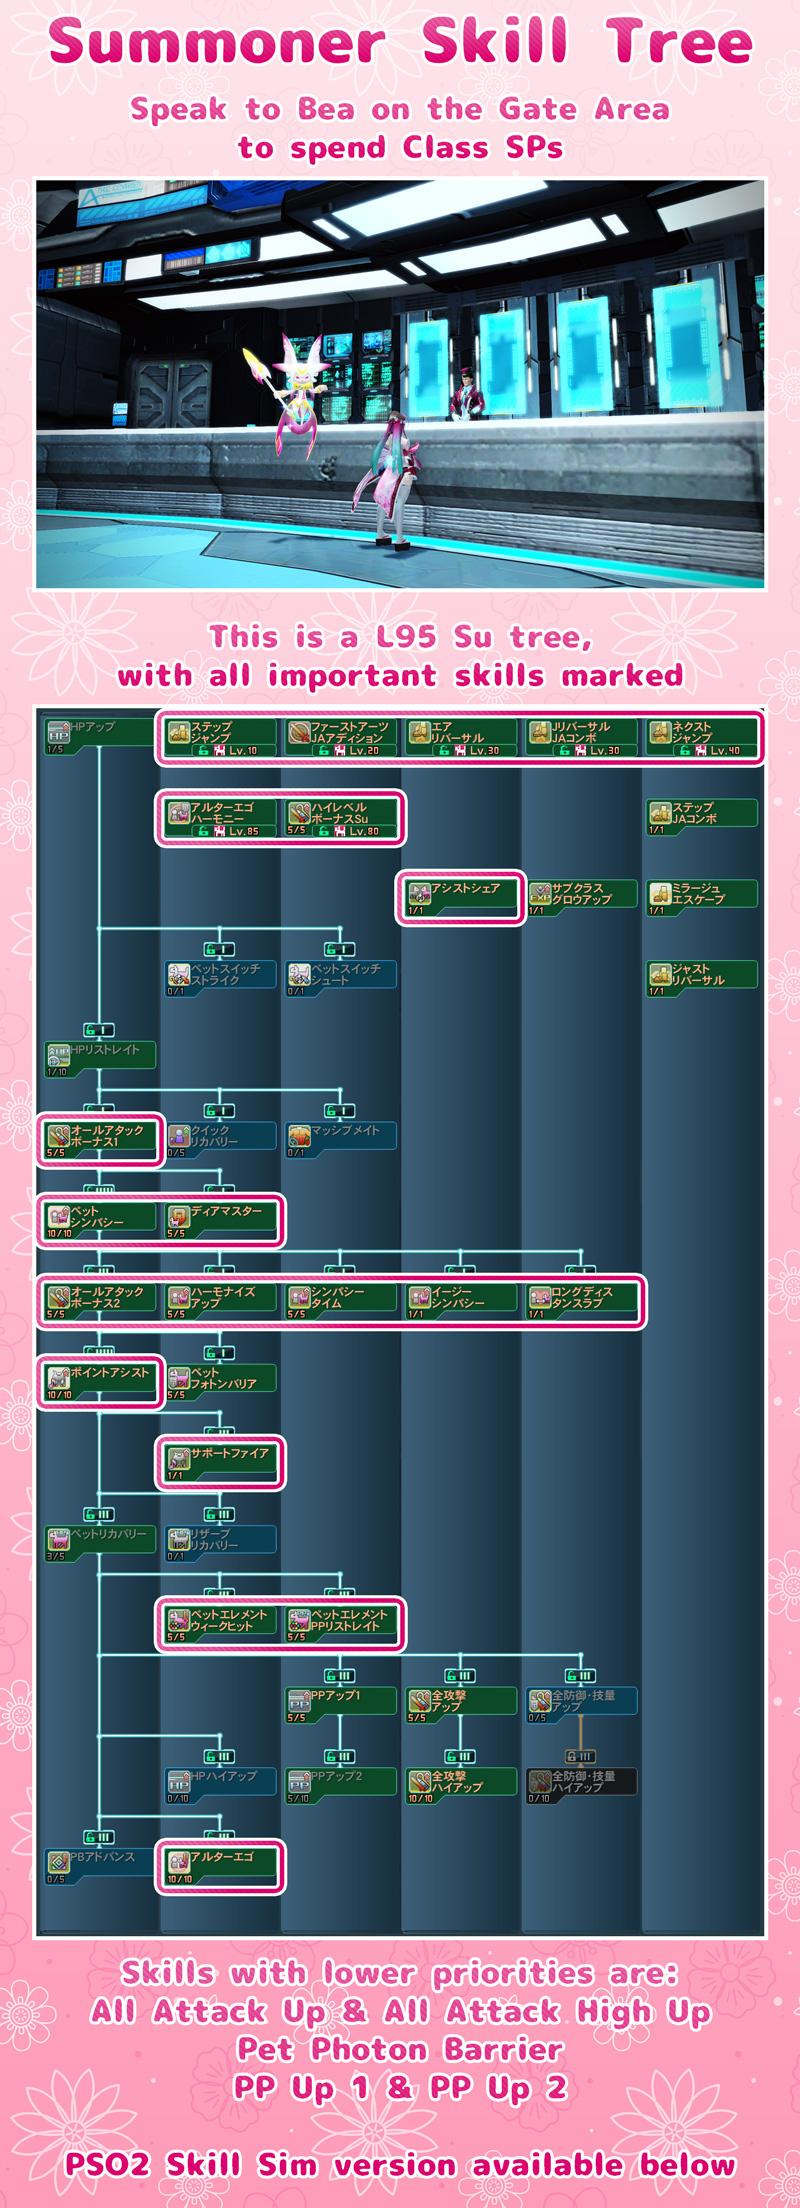 Phantasy Star Online 2 Summoner Guide Capa